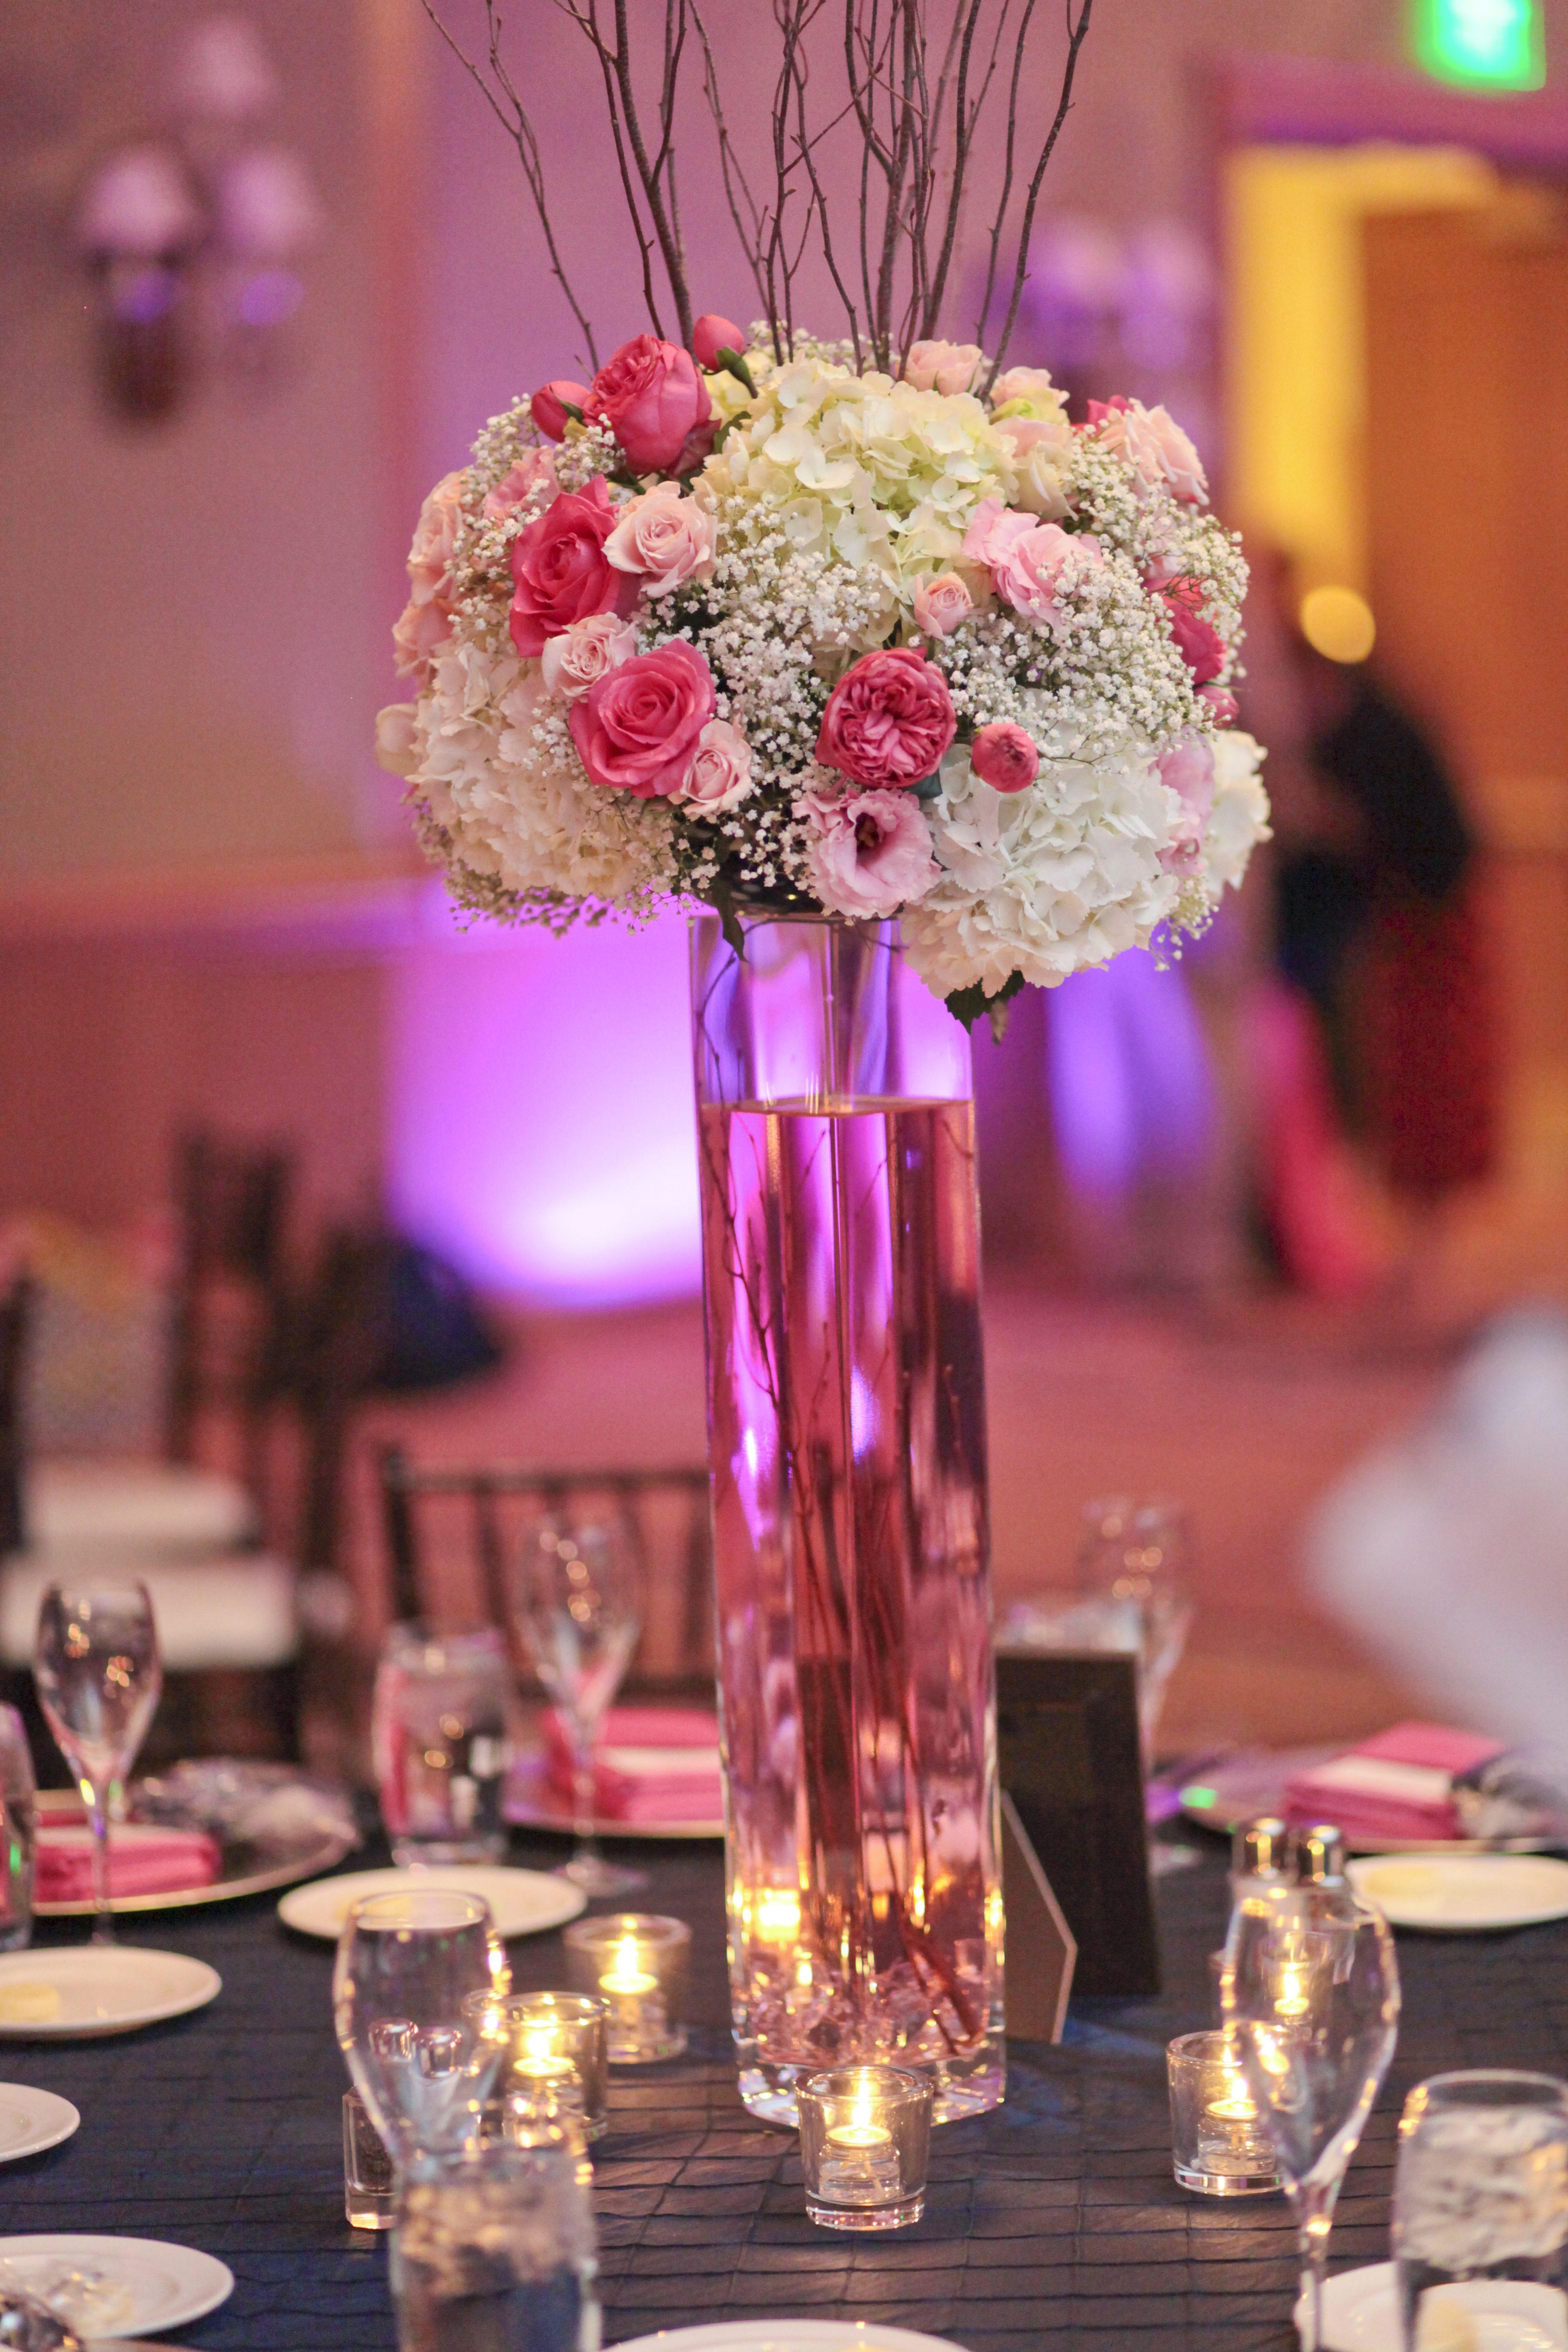 Reception centerpieces | Wedding flowers | Pinterest | Reception ...